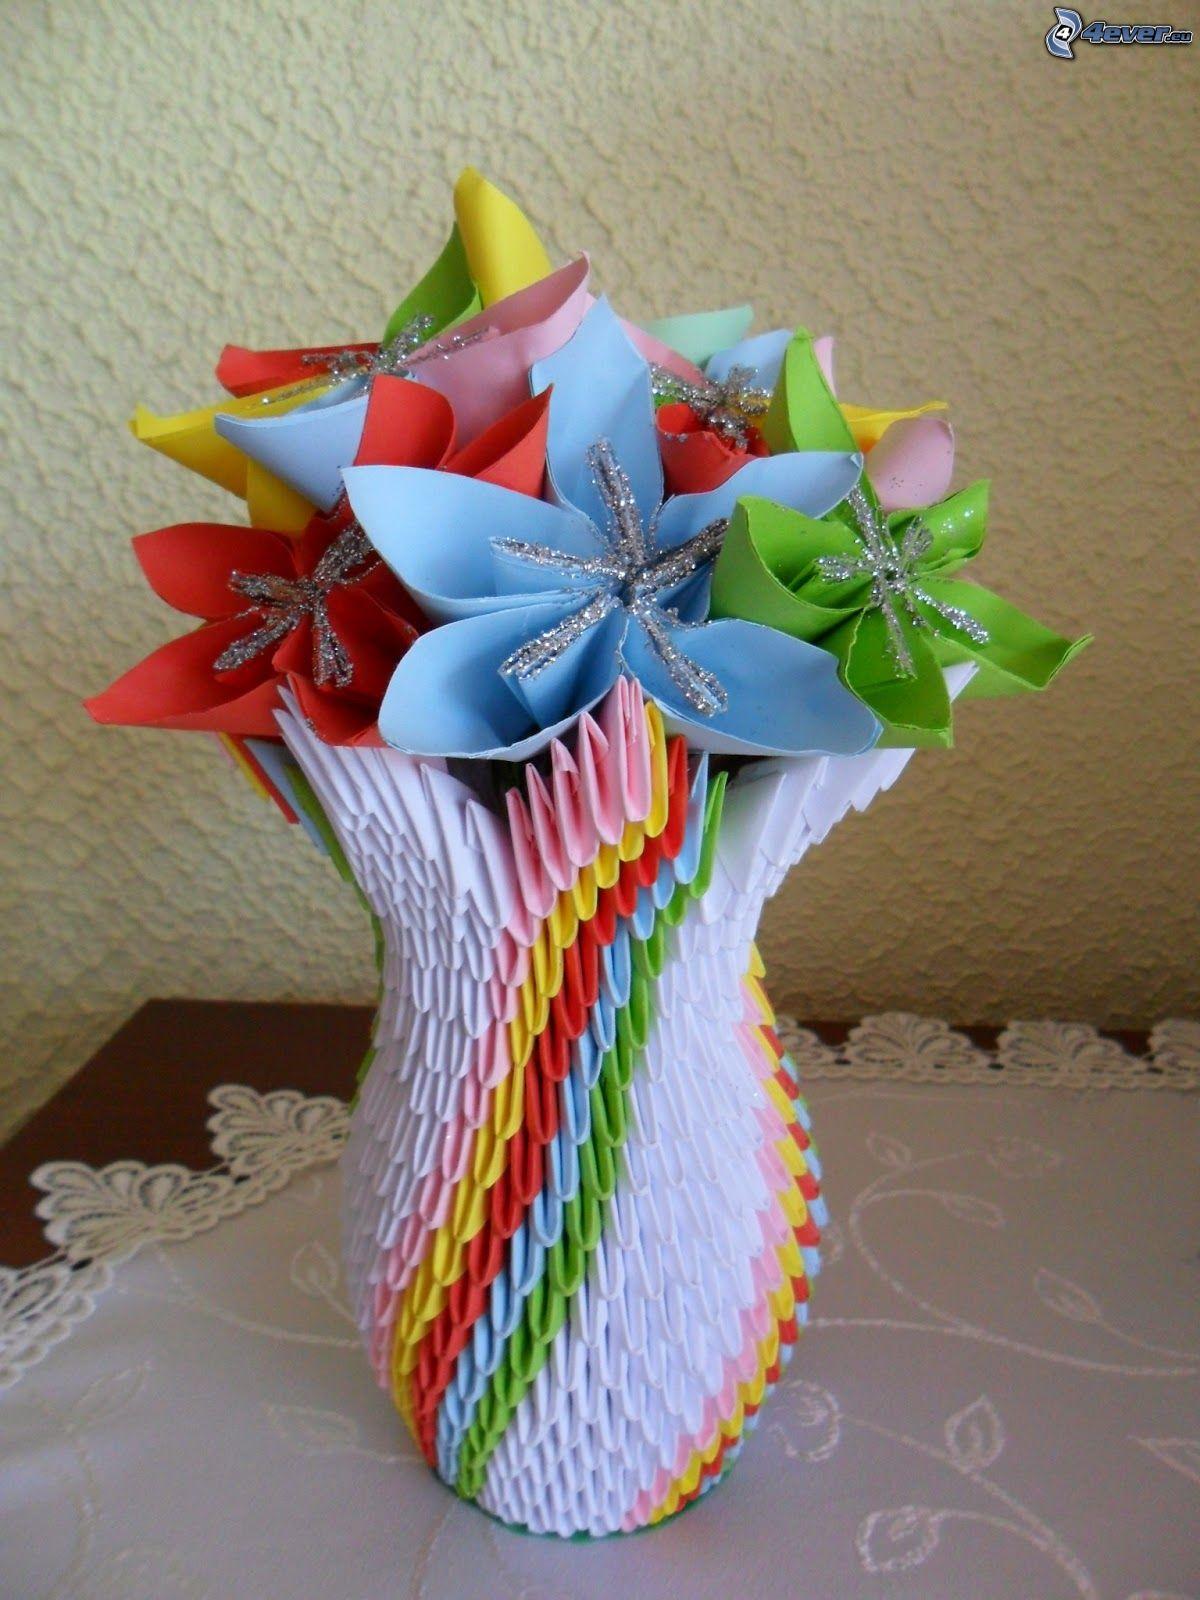 Origami - photo#46